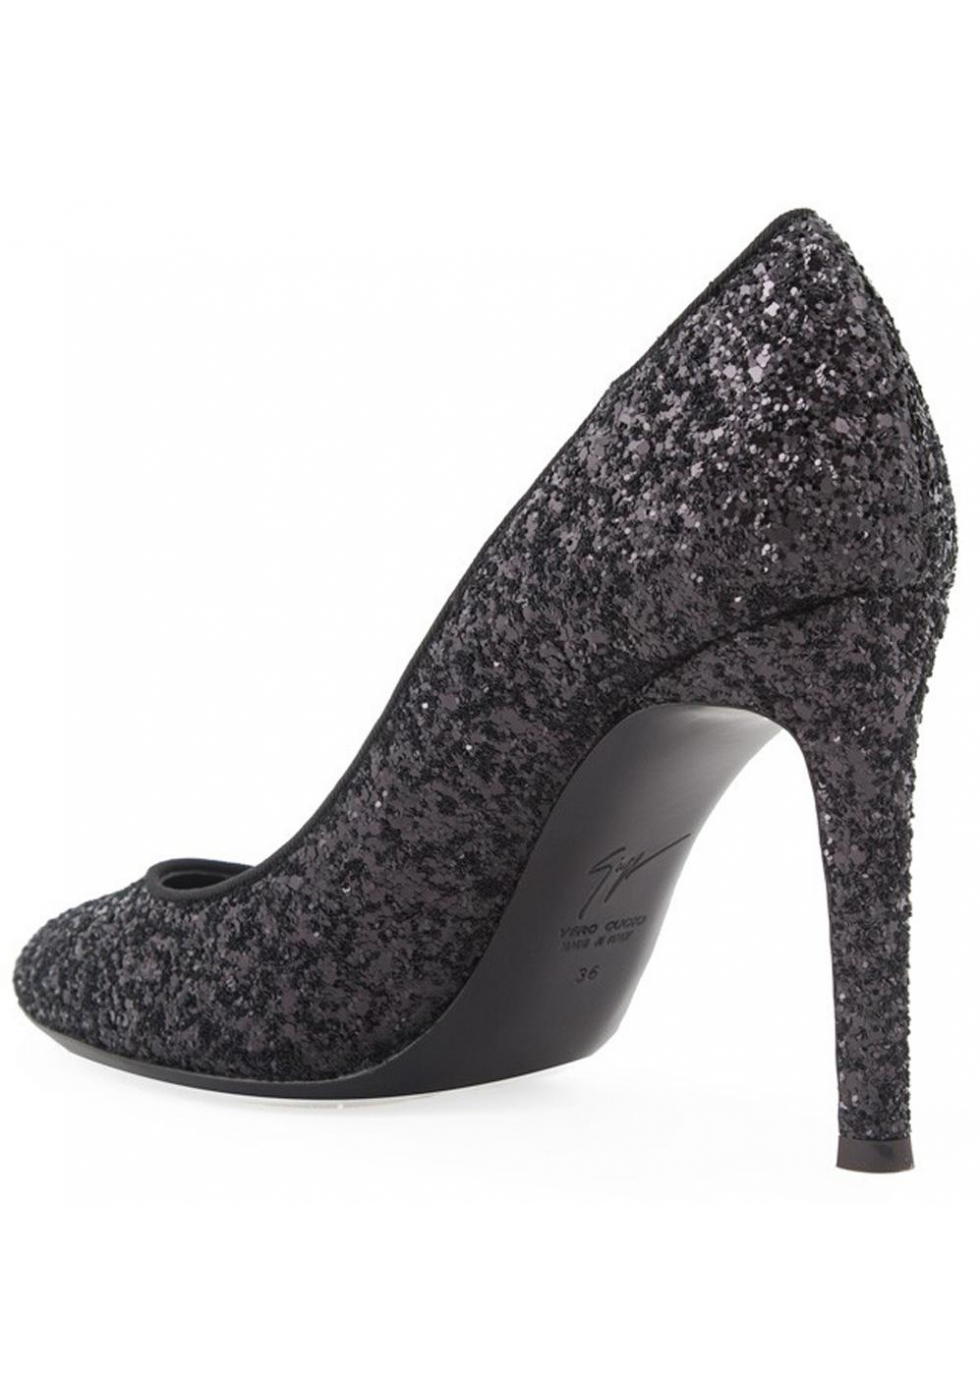 10bef1ae5 Giuseppe Zanotti stiletto heels pumps in black glitter - Italian ...